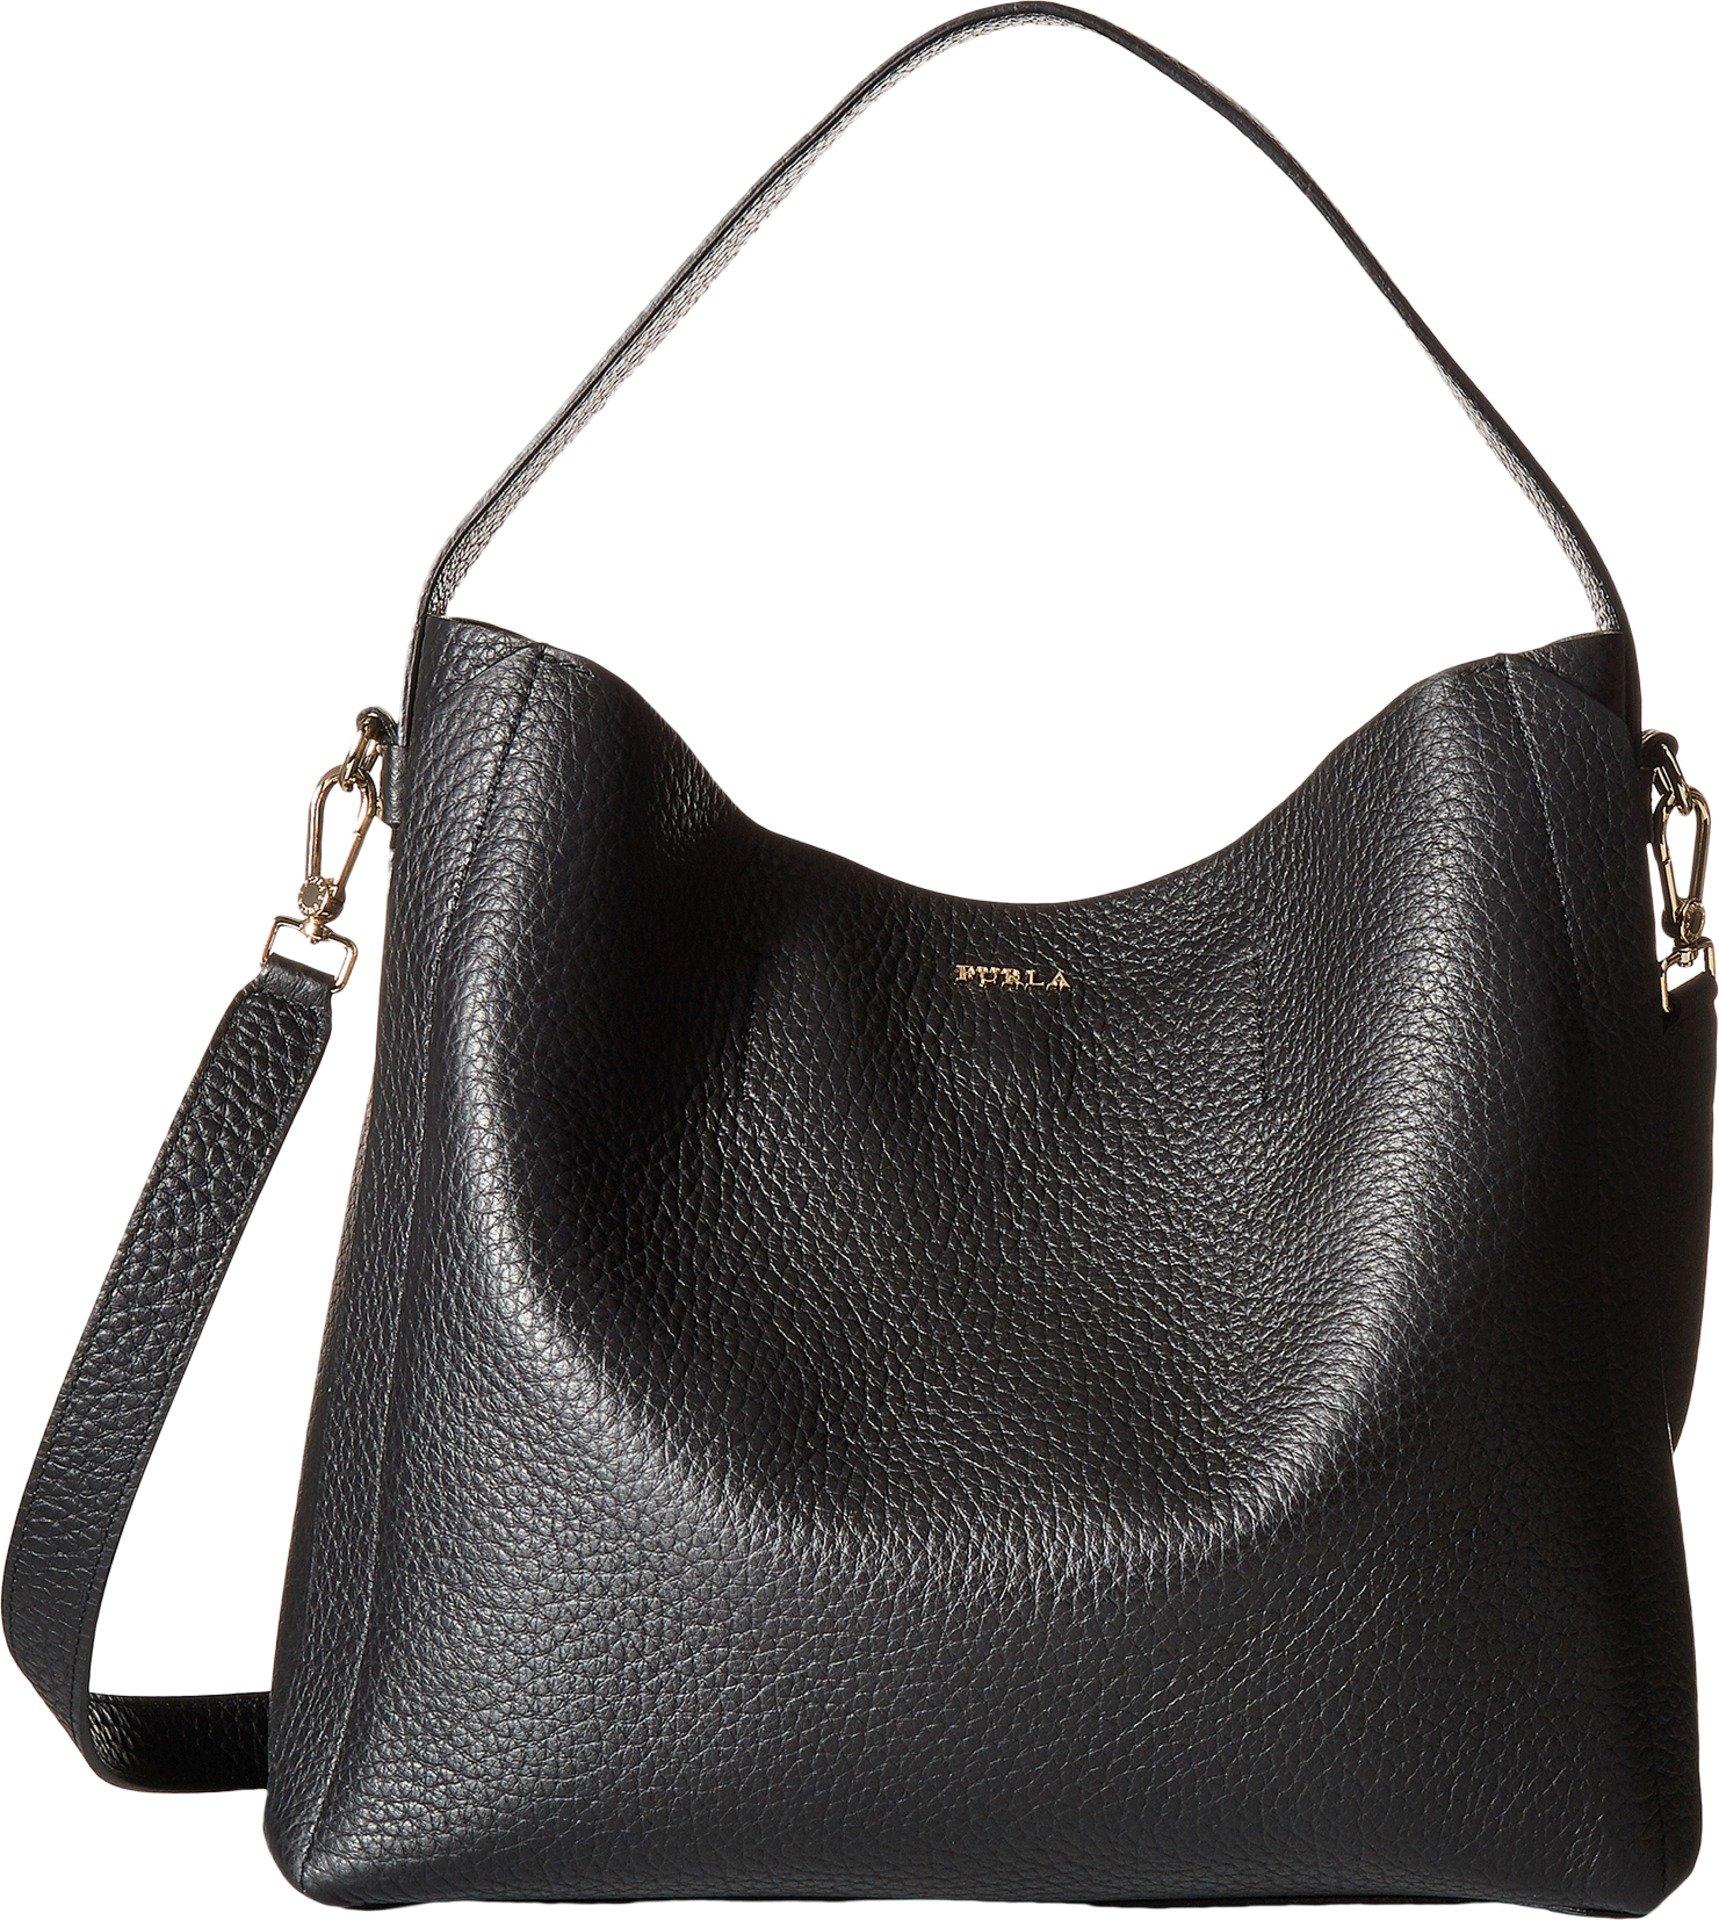 Furla Women's Capriccio Medium Hobo Bag, Onyx, One Size